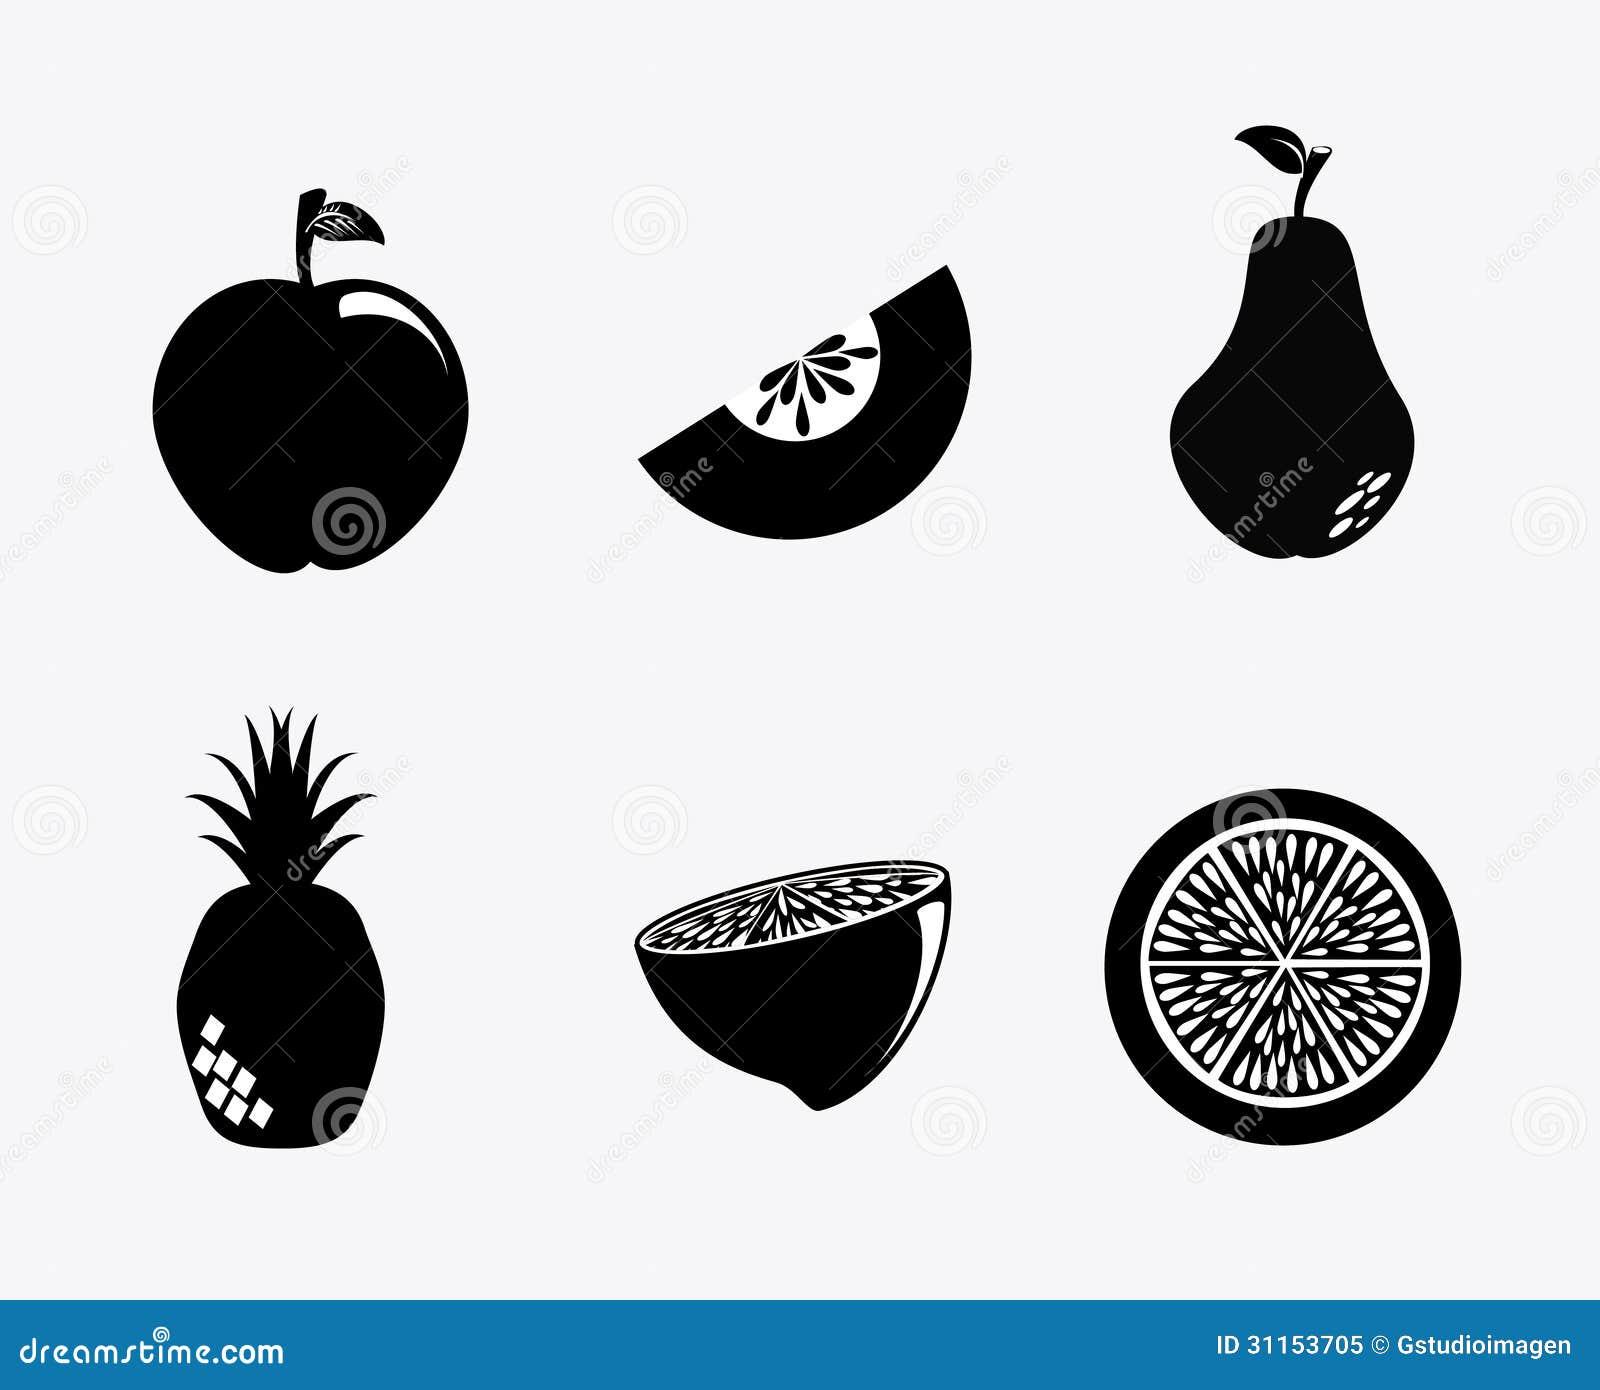 Download Vegetable Clip Art  Free Clipart of Vegetables